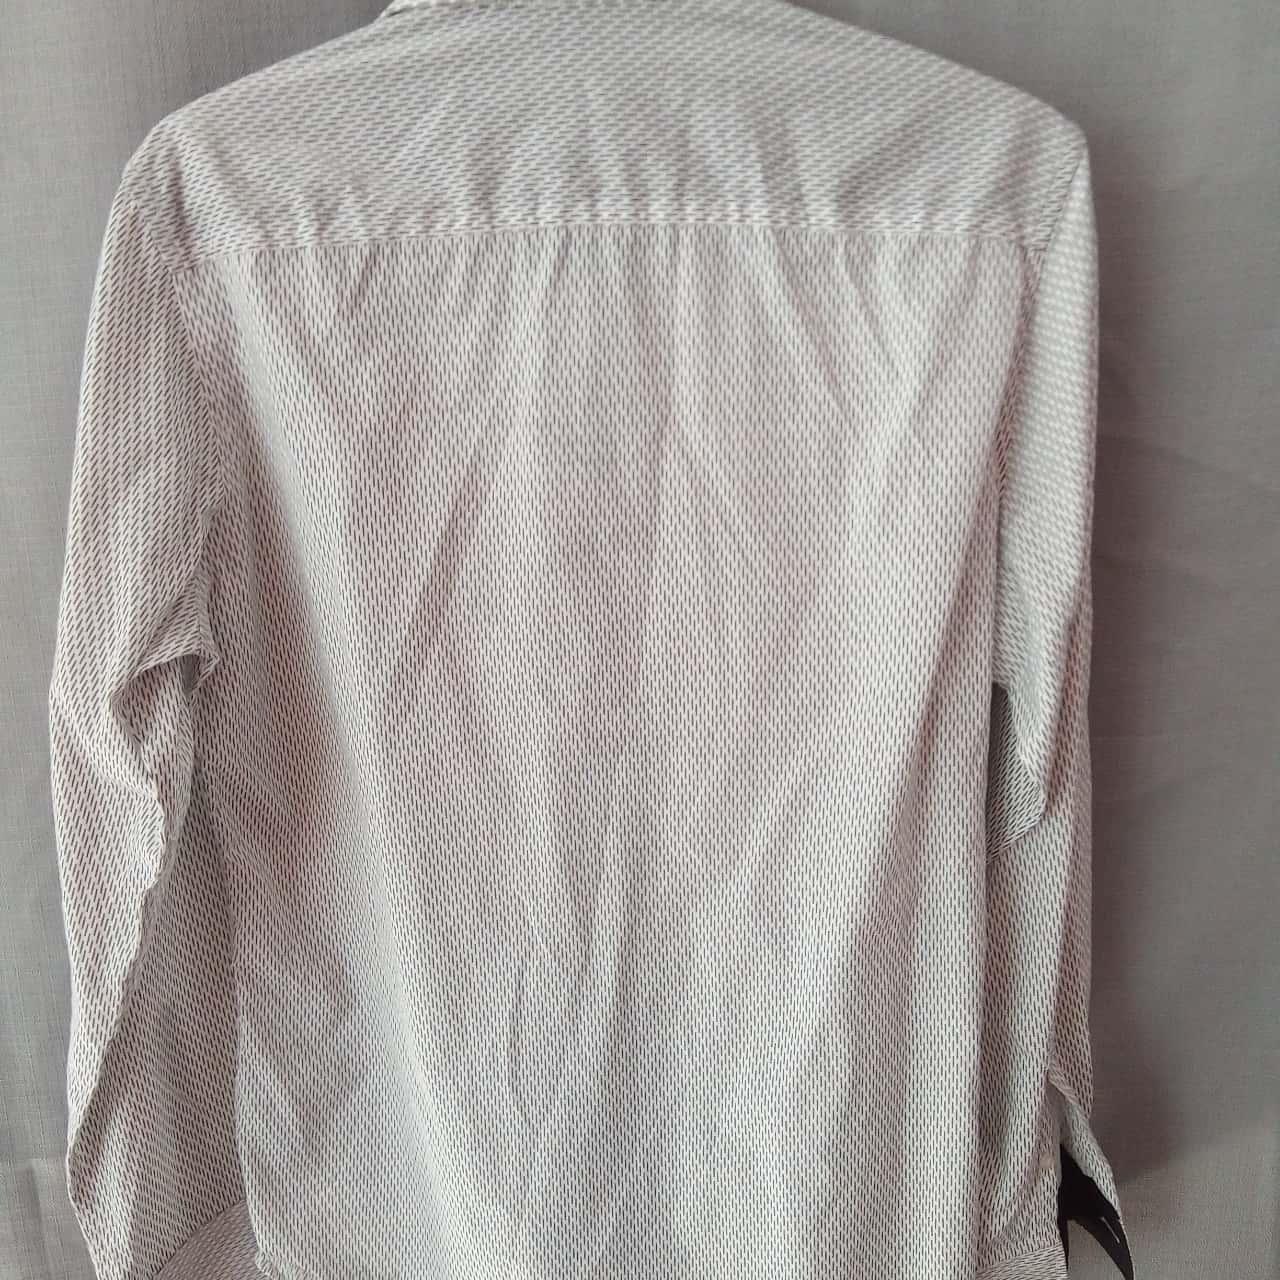 Tarocash Mens White With Black Pattern Long Sleeve Shirt Size S UAN